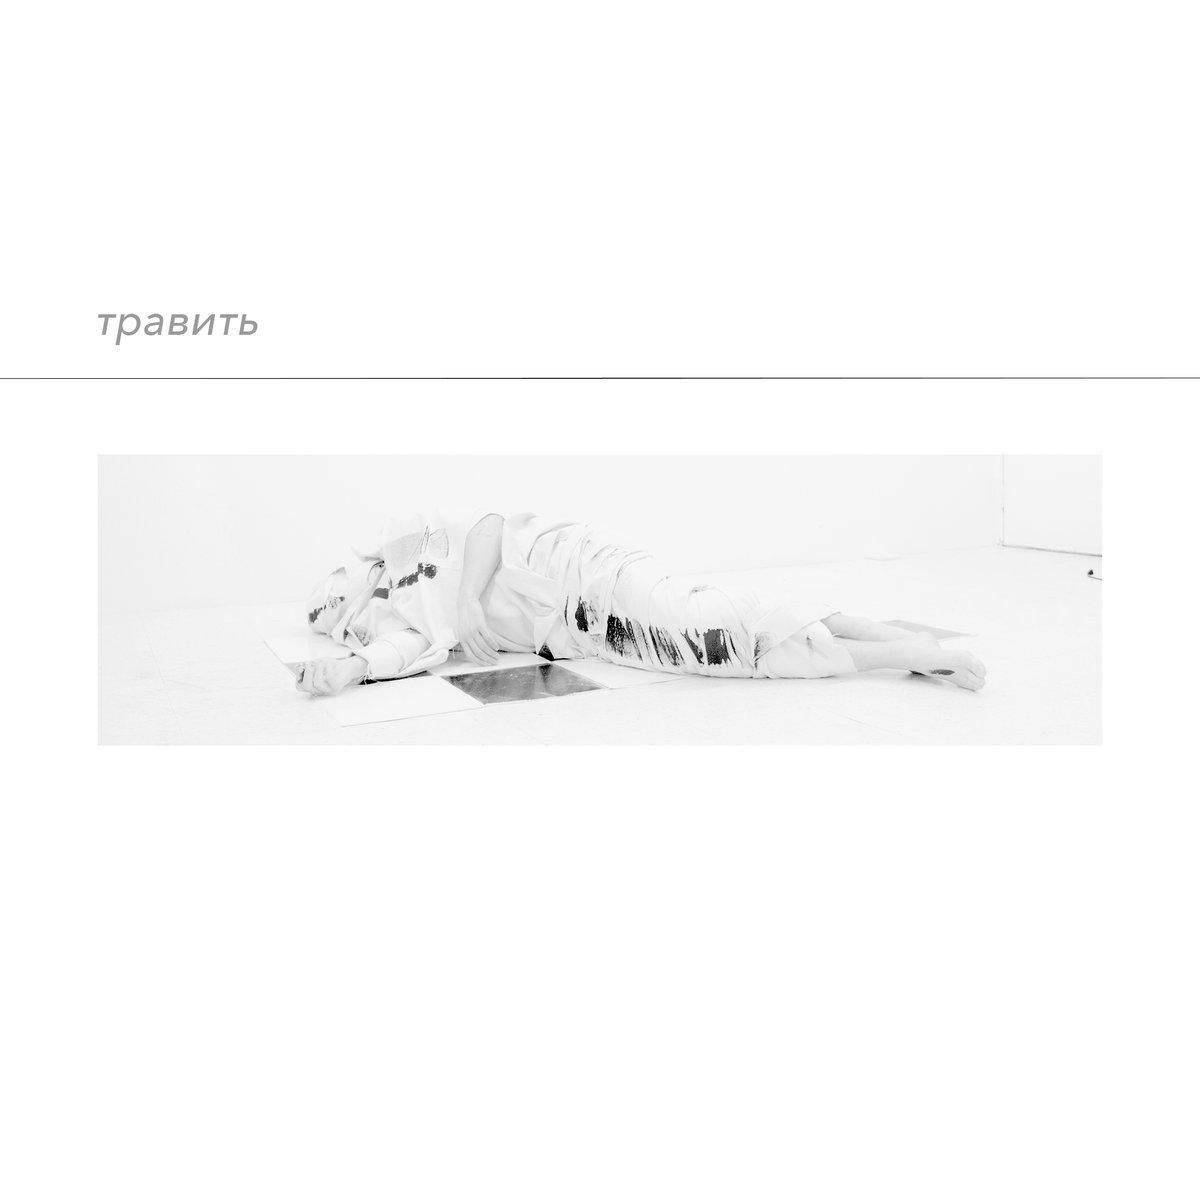 Vierance - травить (EP; 2016)